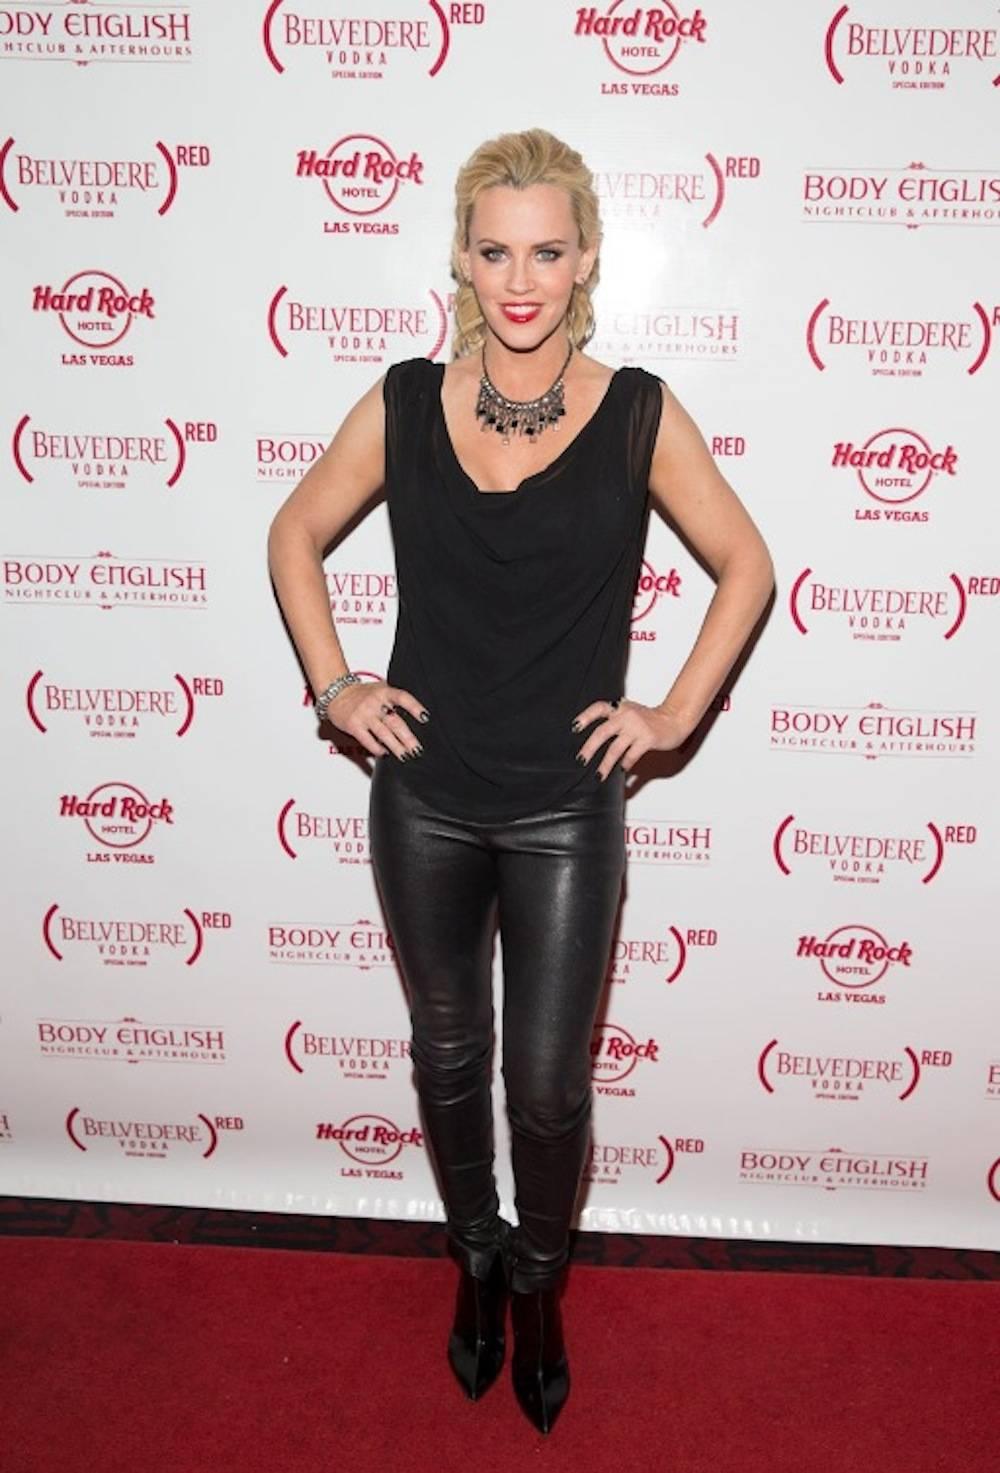 11.30_Jenny McCarthy on the red carpet_Body English Nightclub & Afterhours_Hard Rock Hotel & Casino_Photo Credit Erik Kabik